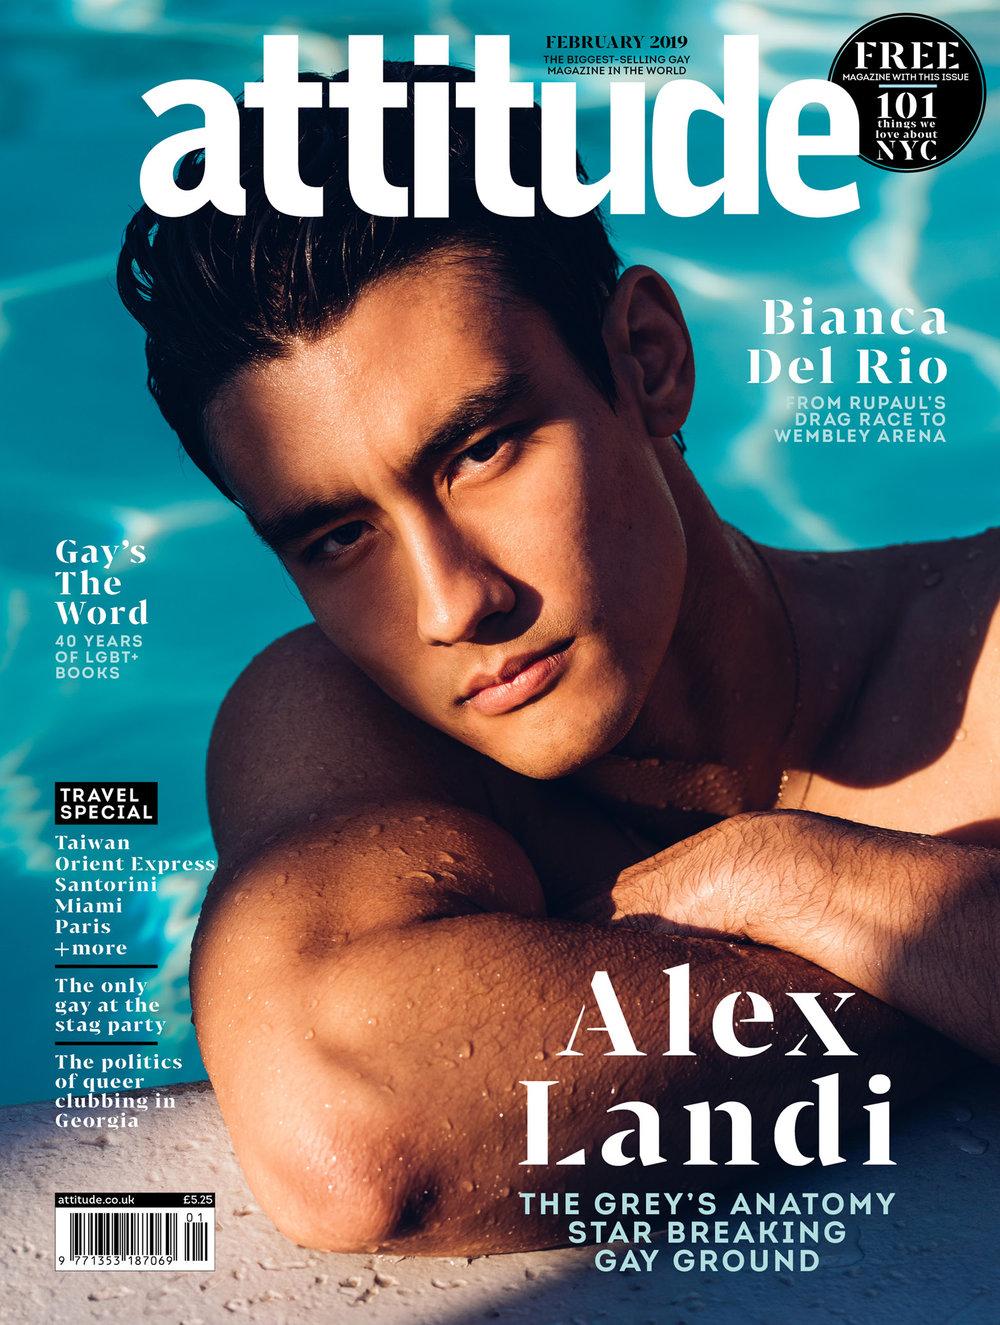 305 Alex Landi Square cover.jpg